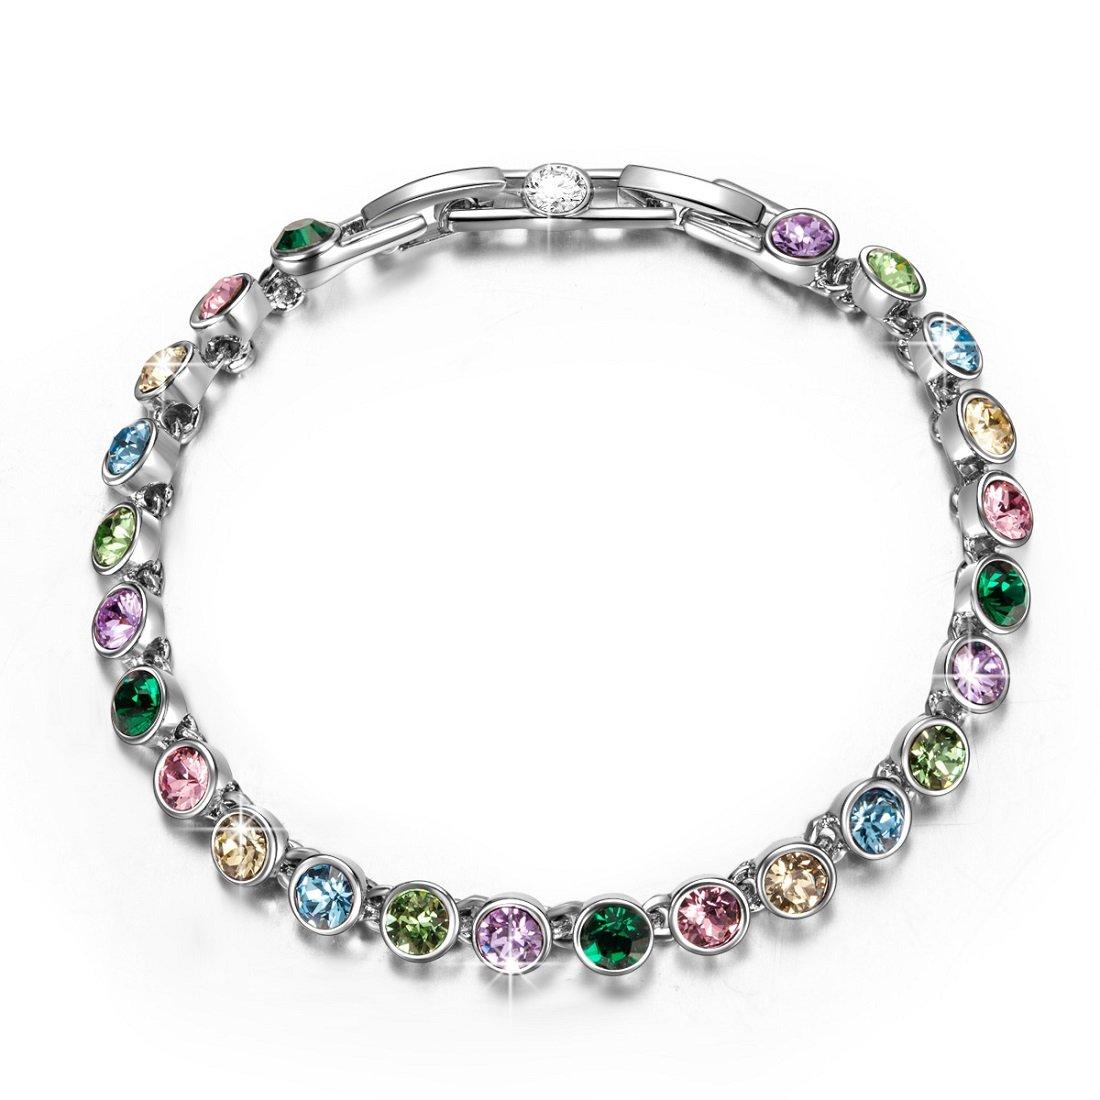 QIANSE Fairy Lights Multicoloured Swarovski Crystals Tennis Bracelet Tennis Bracelets for Women Bracelets for Girls Jewelry for Women Birthday Gifts for Daughter Granddaughter